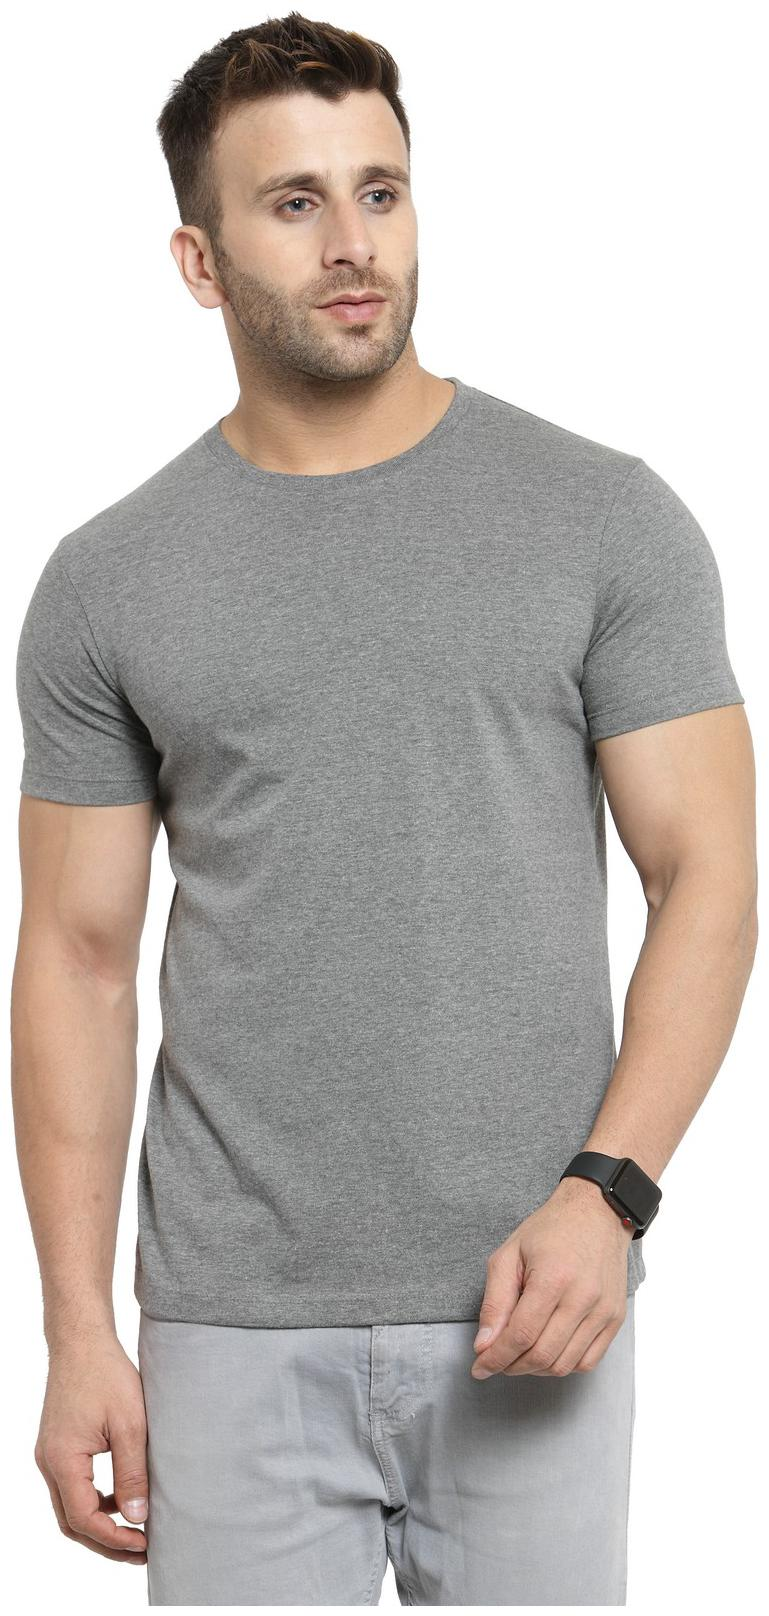 Scott Men's Regular Fit Cotton Round Neck T-shirt - Charcoal